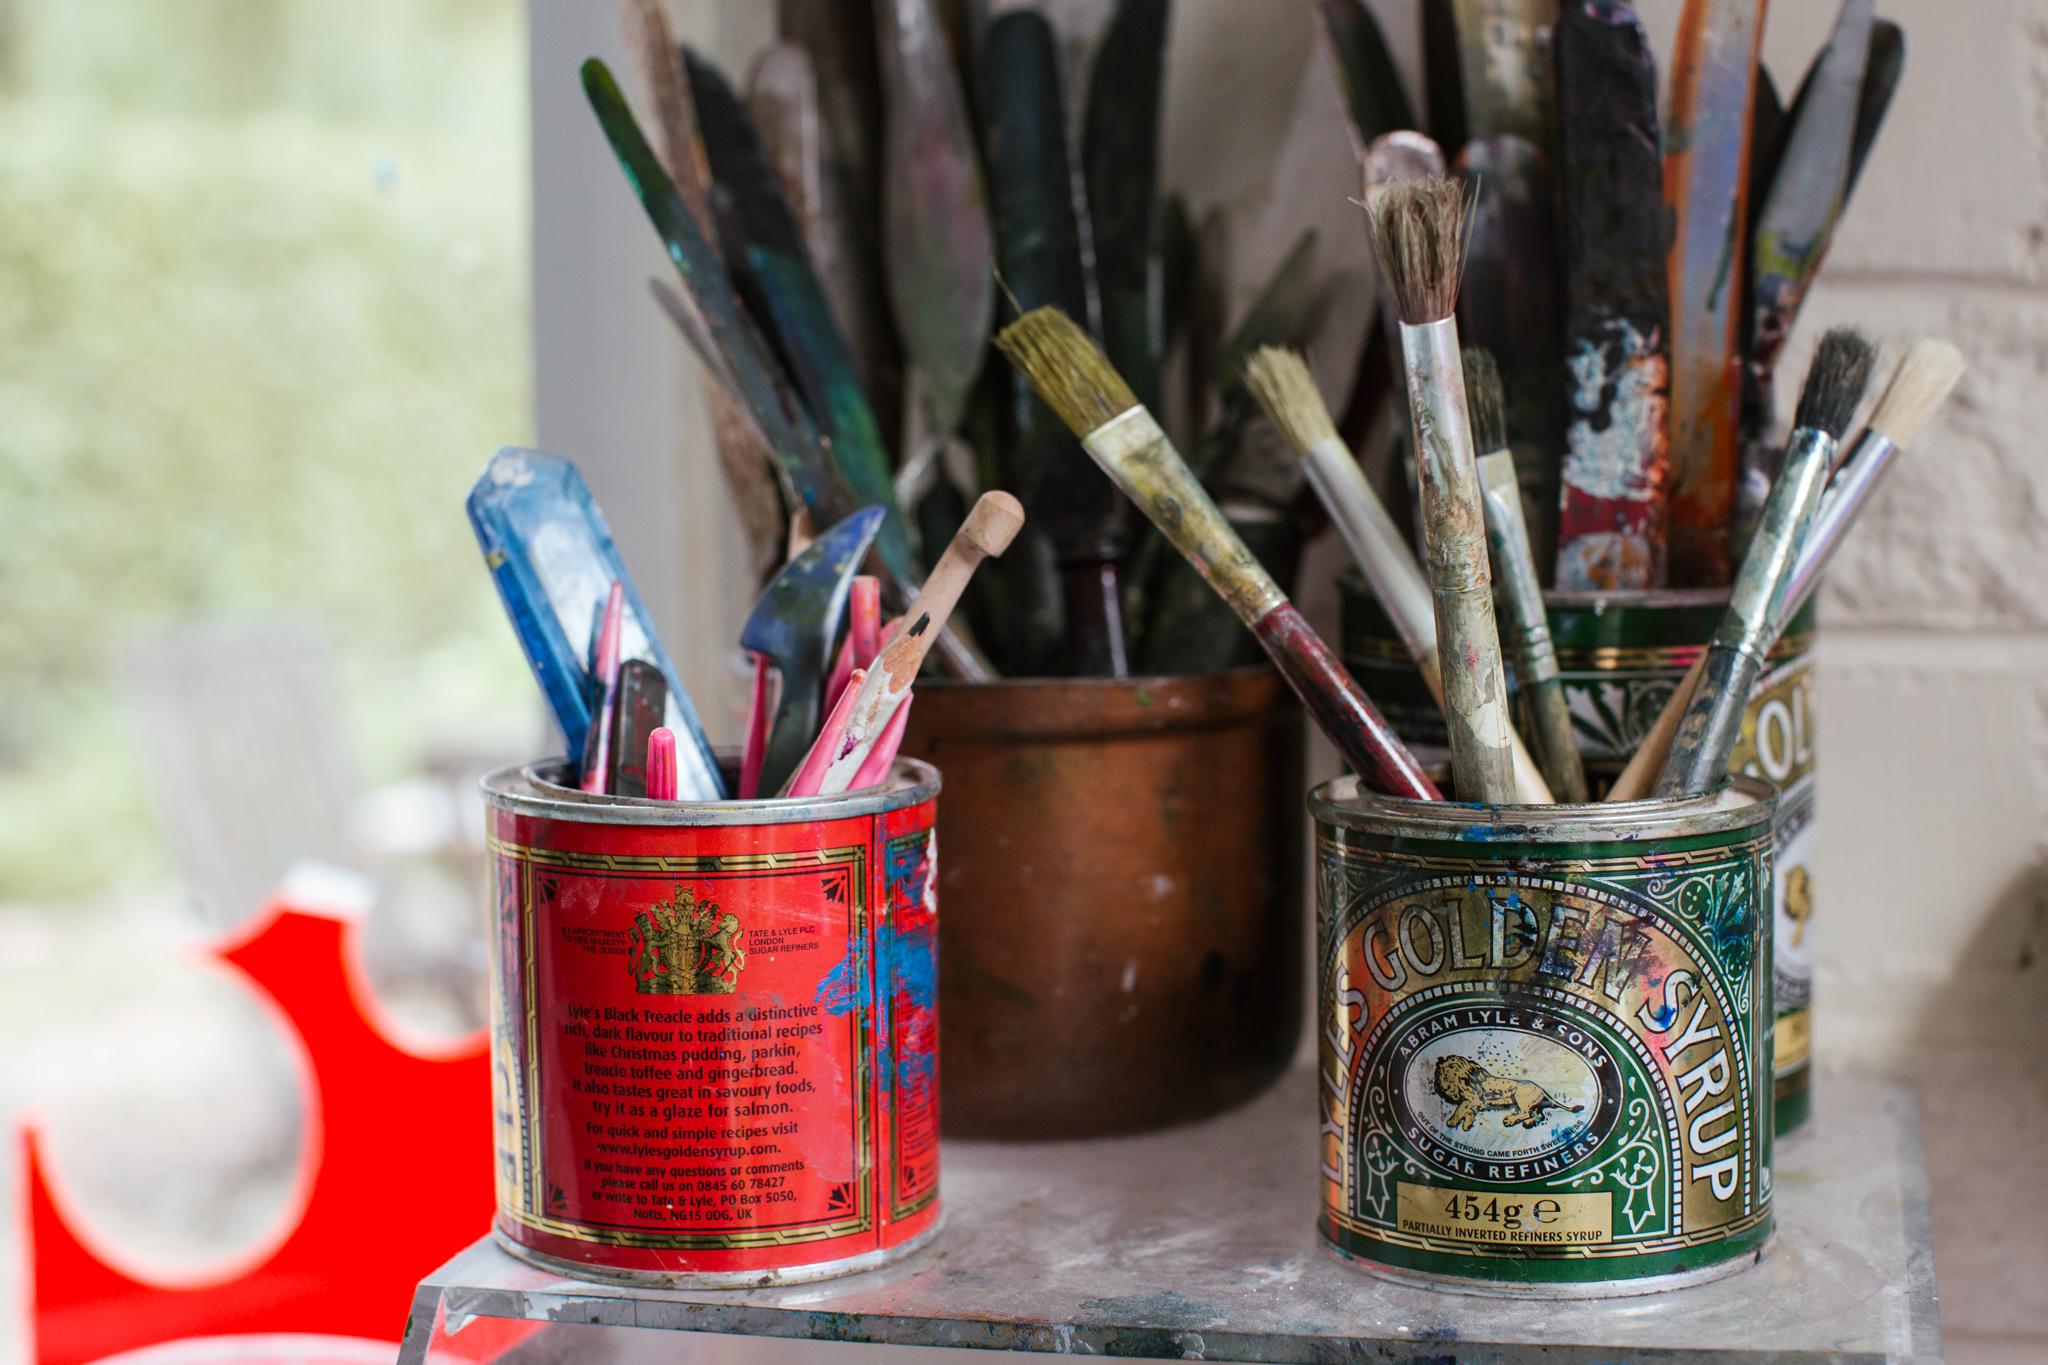 Lifestyle-artist-studio-Joanne-Crawford-Leeds-15.JPG